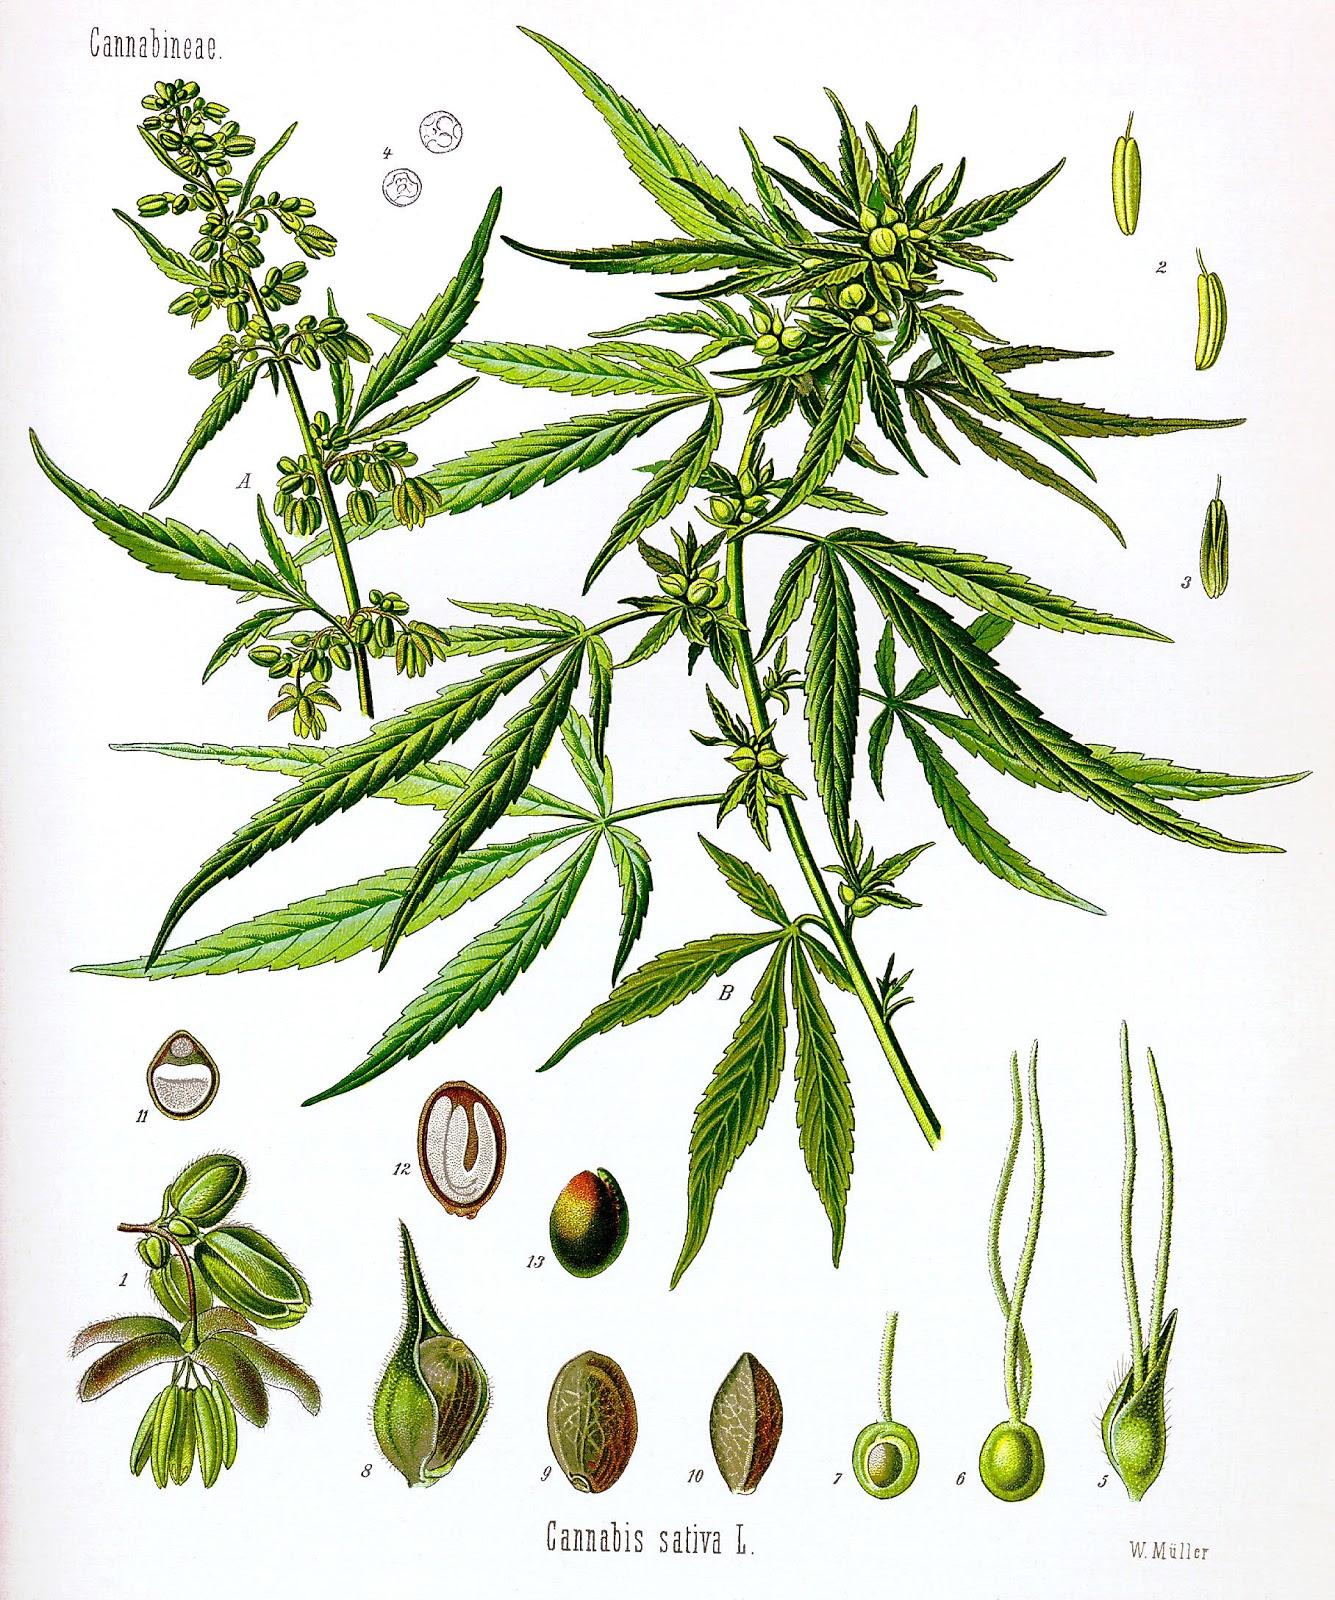 Cannabis_sativa_Koehler_drawing.jpg